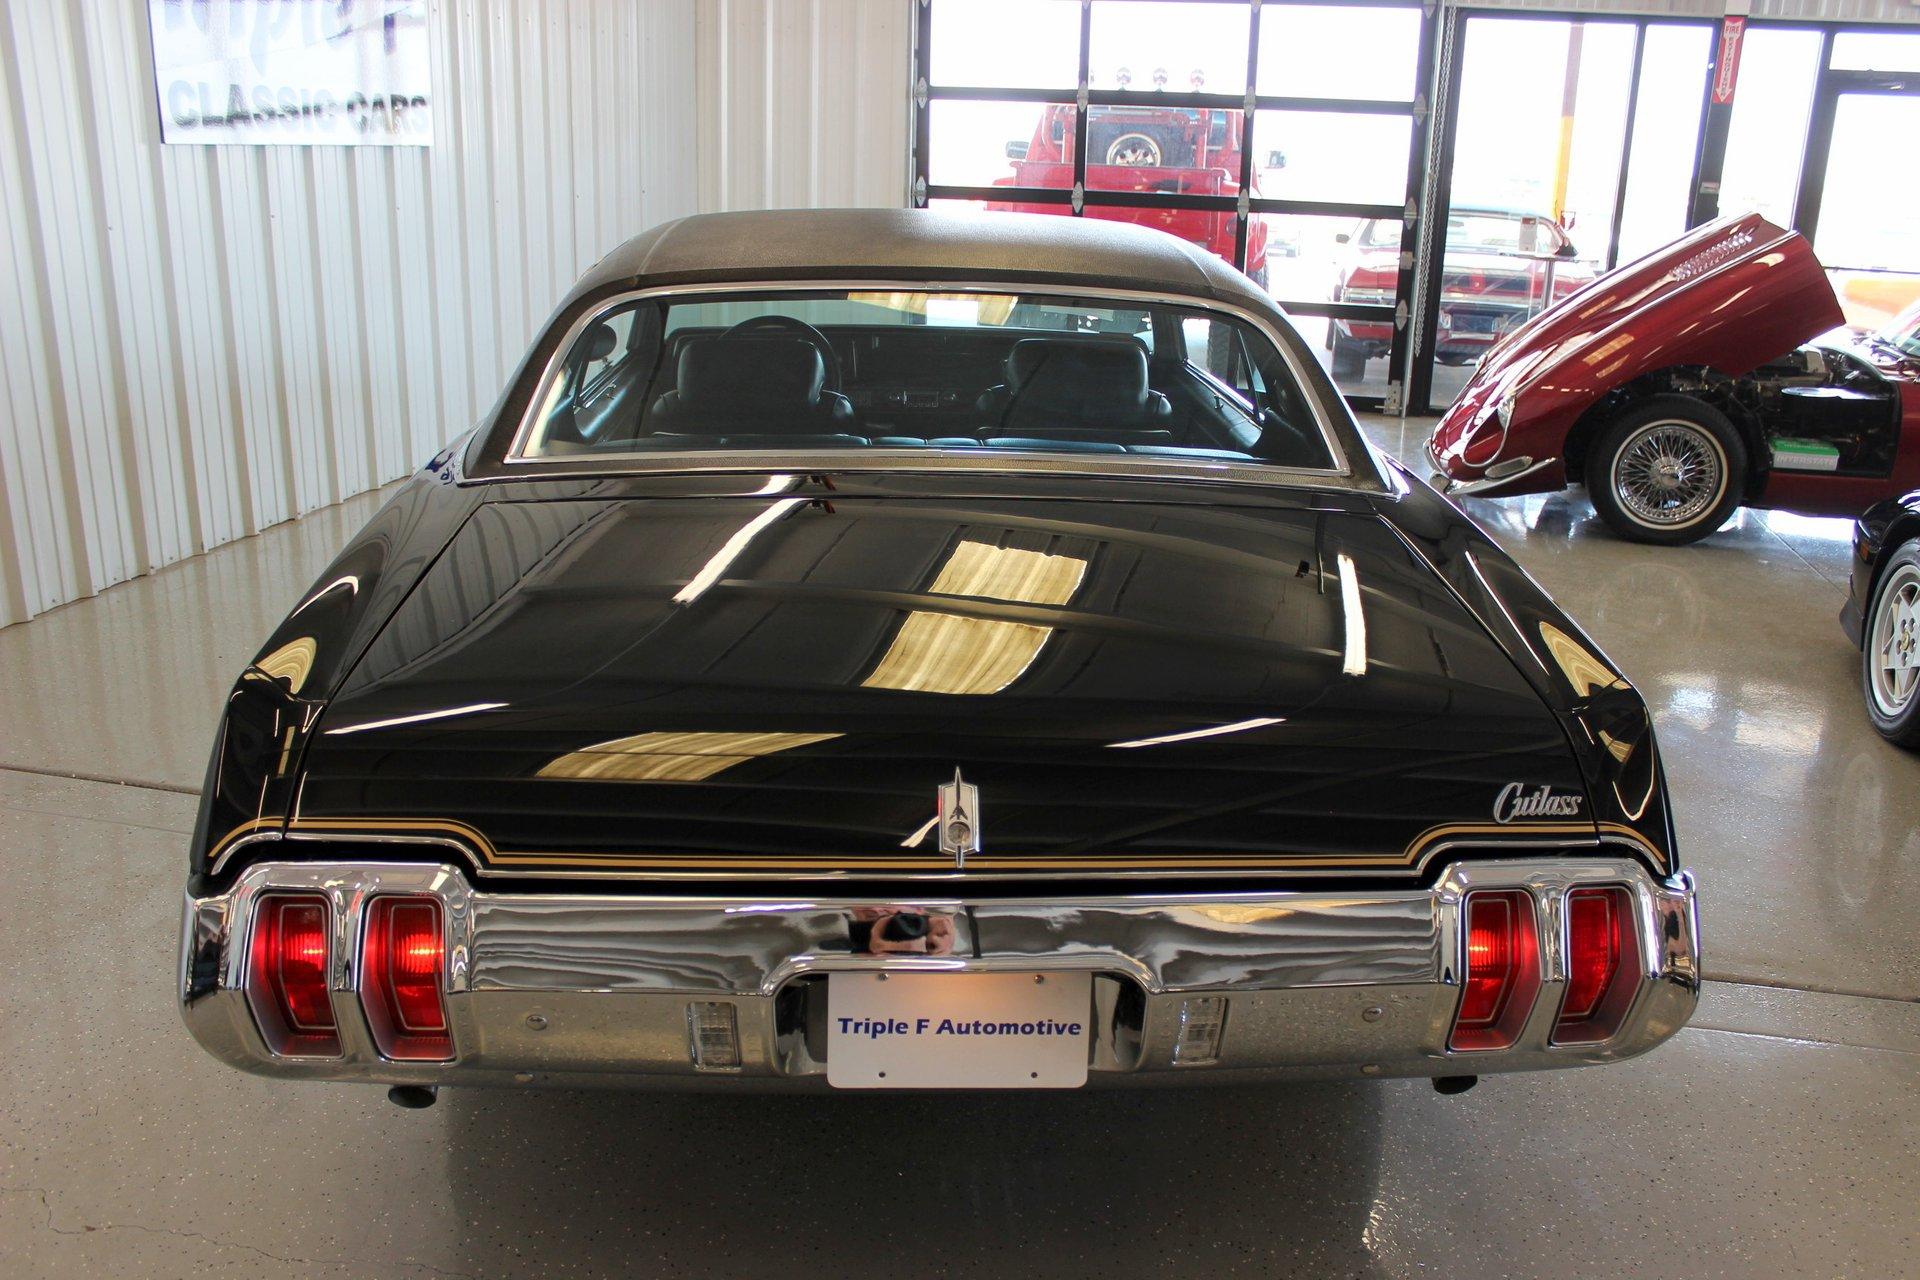 1970 Oldsmobile Cutlass | Triple F Automotive